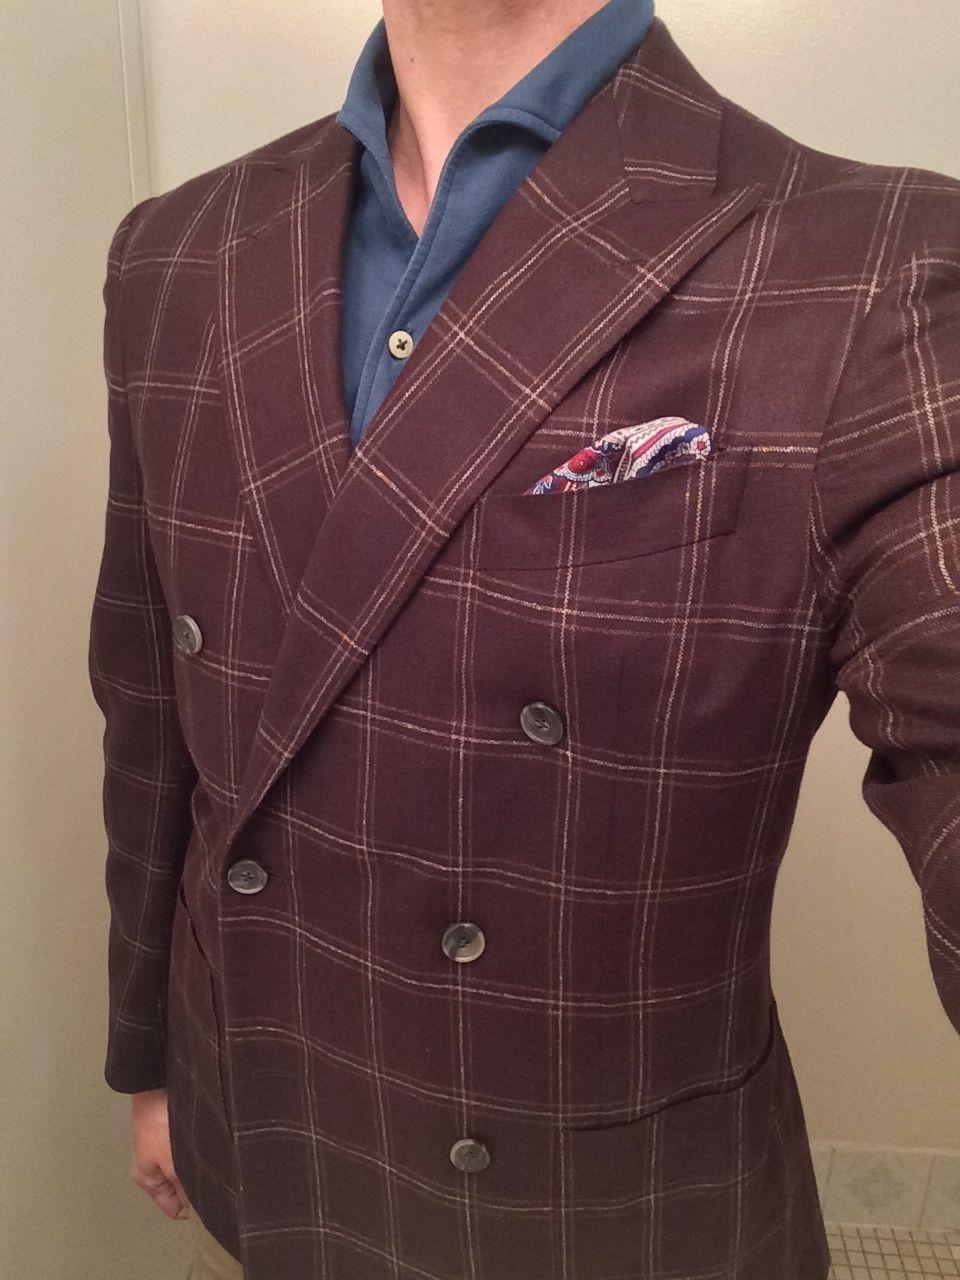 Eidos Brown DB jacket, Teal Lupo